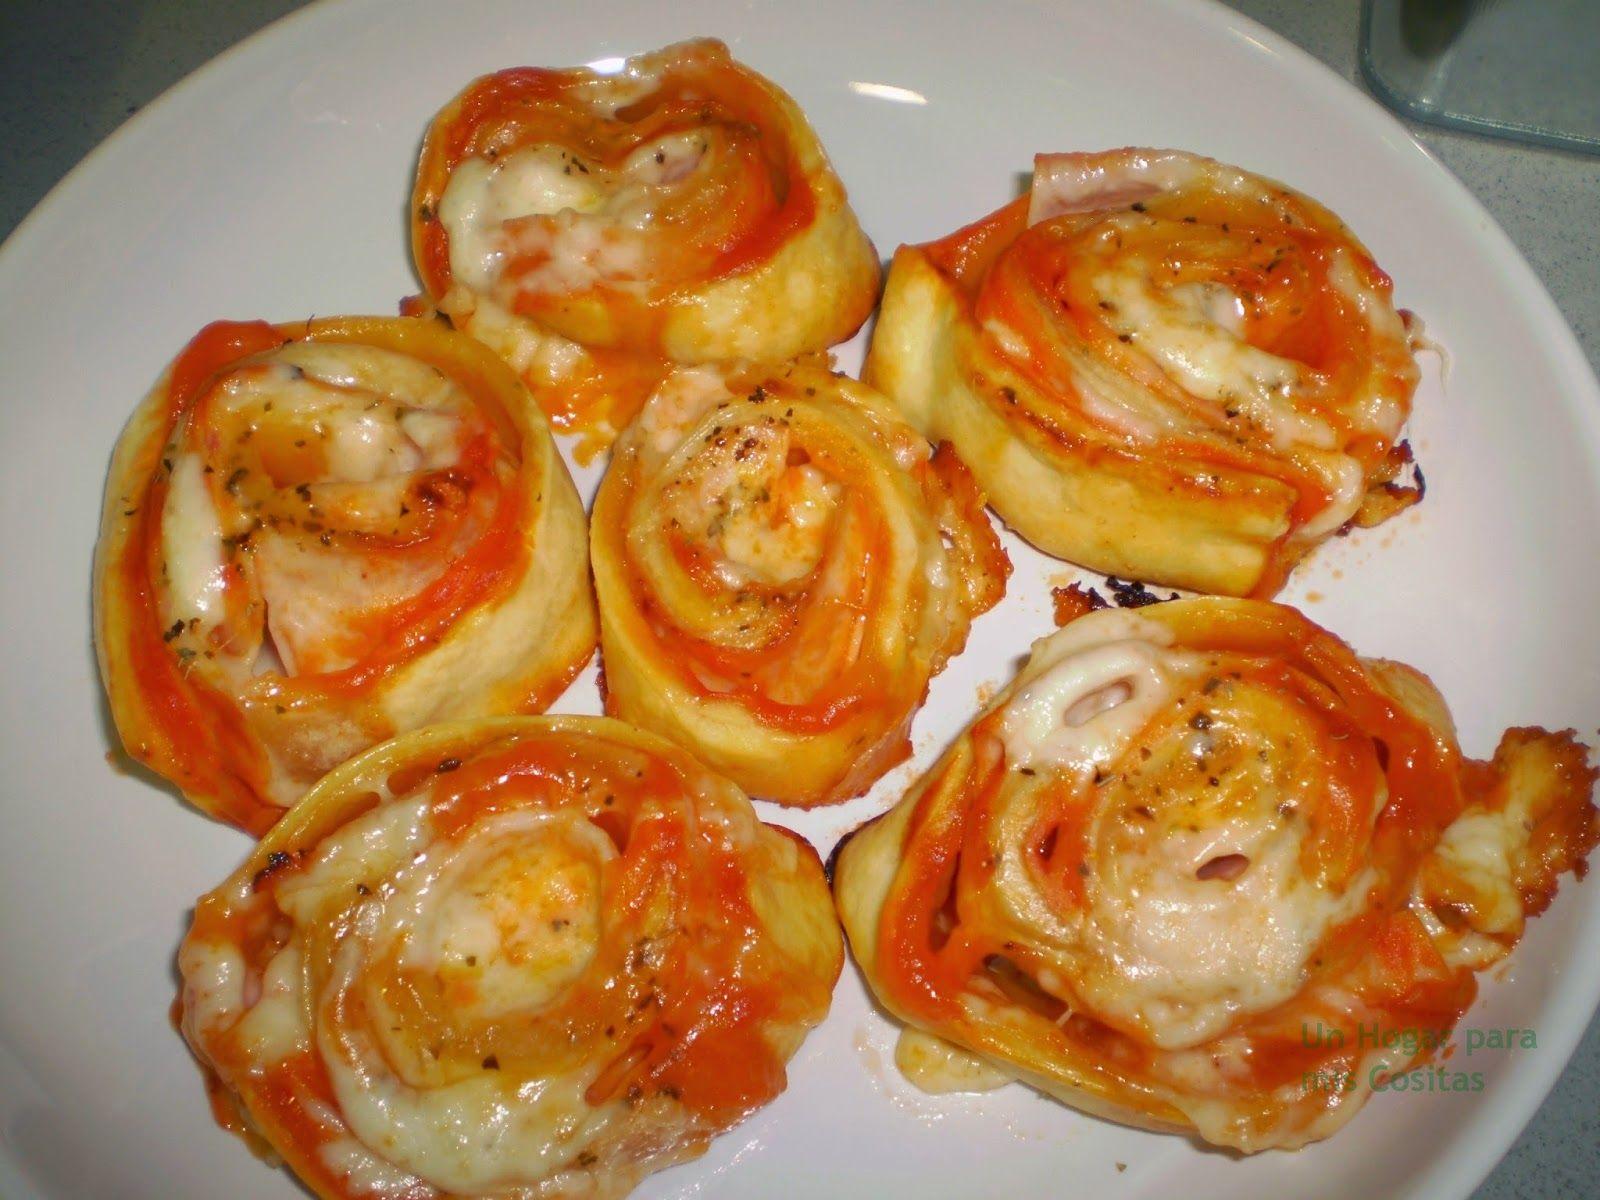 Un Hogar para mis Cositas: Ideas sencillas para cocinar con masa de ...